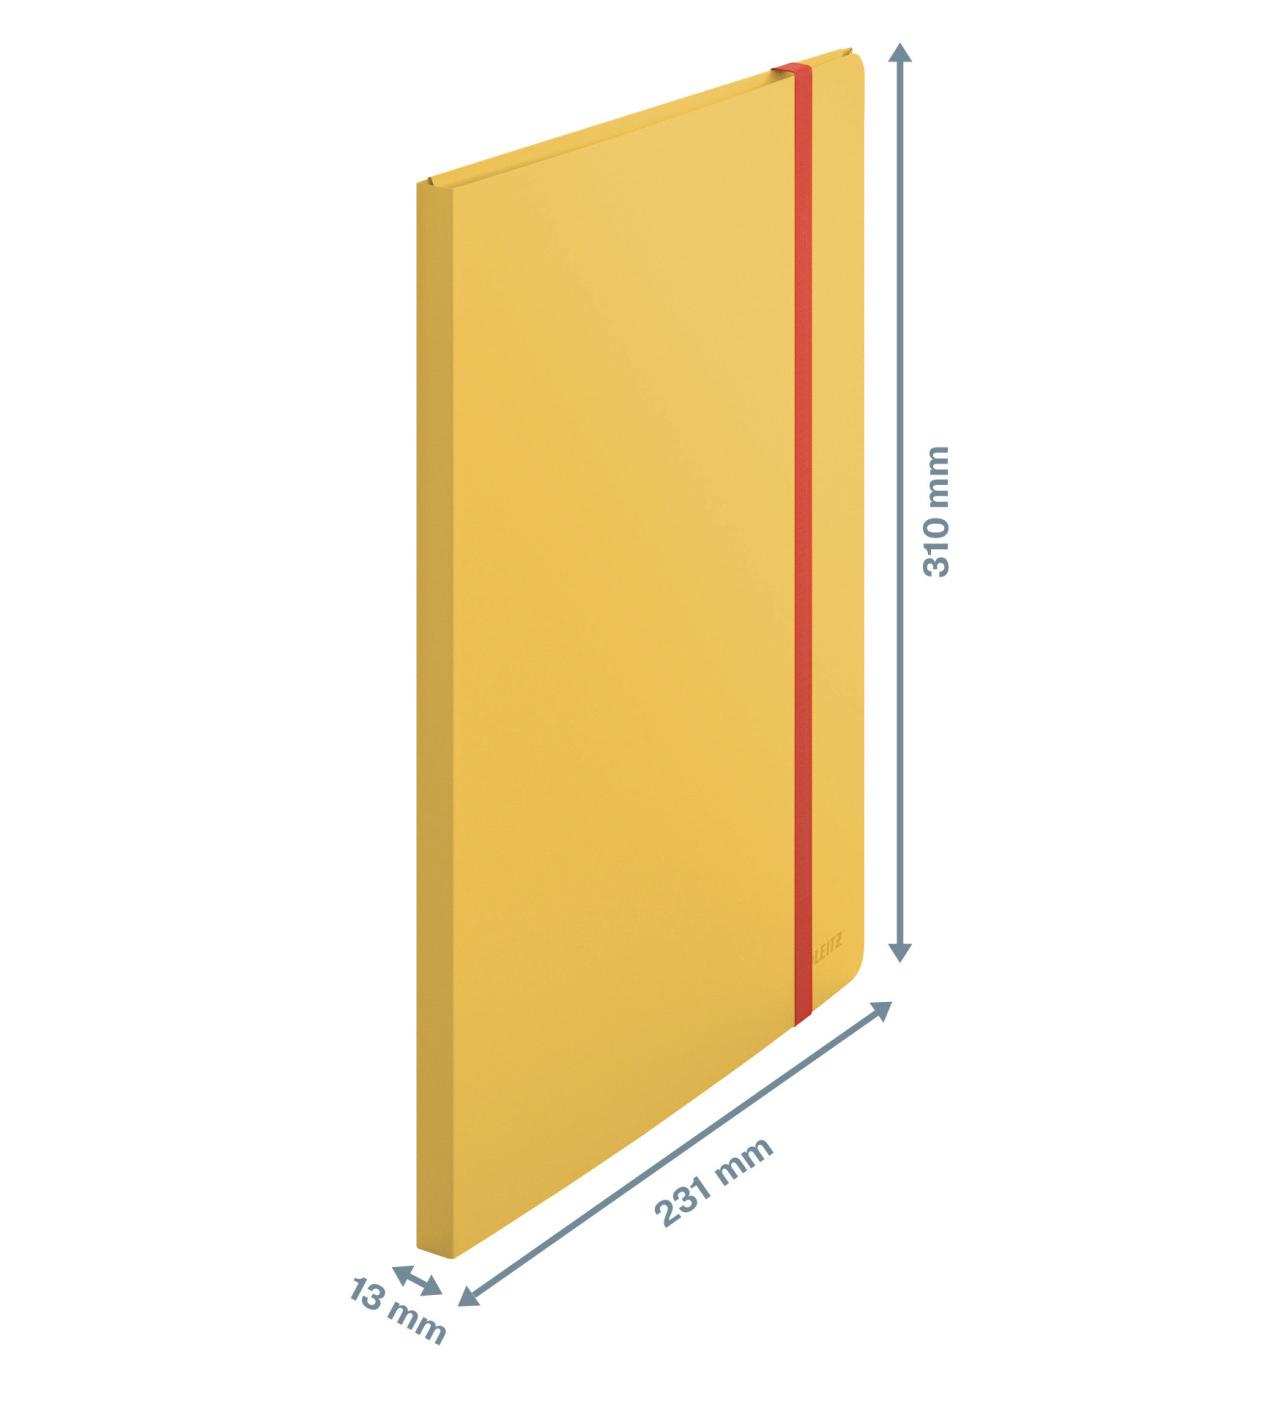 Папка на 20 файлов COSY с тремя клапанами на резинке, желт. LEITZ - фото 3